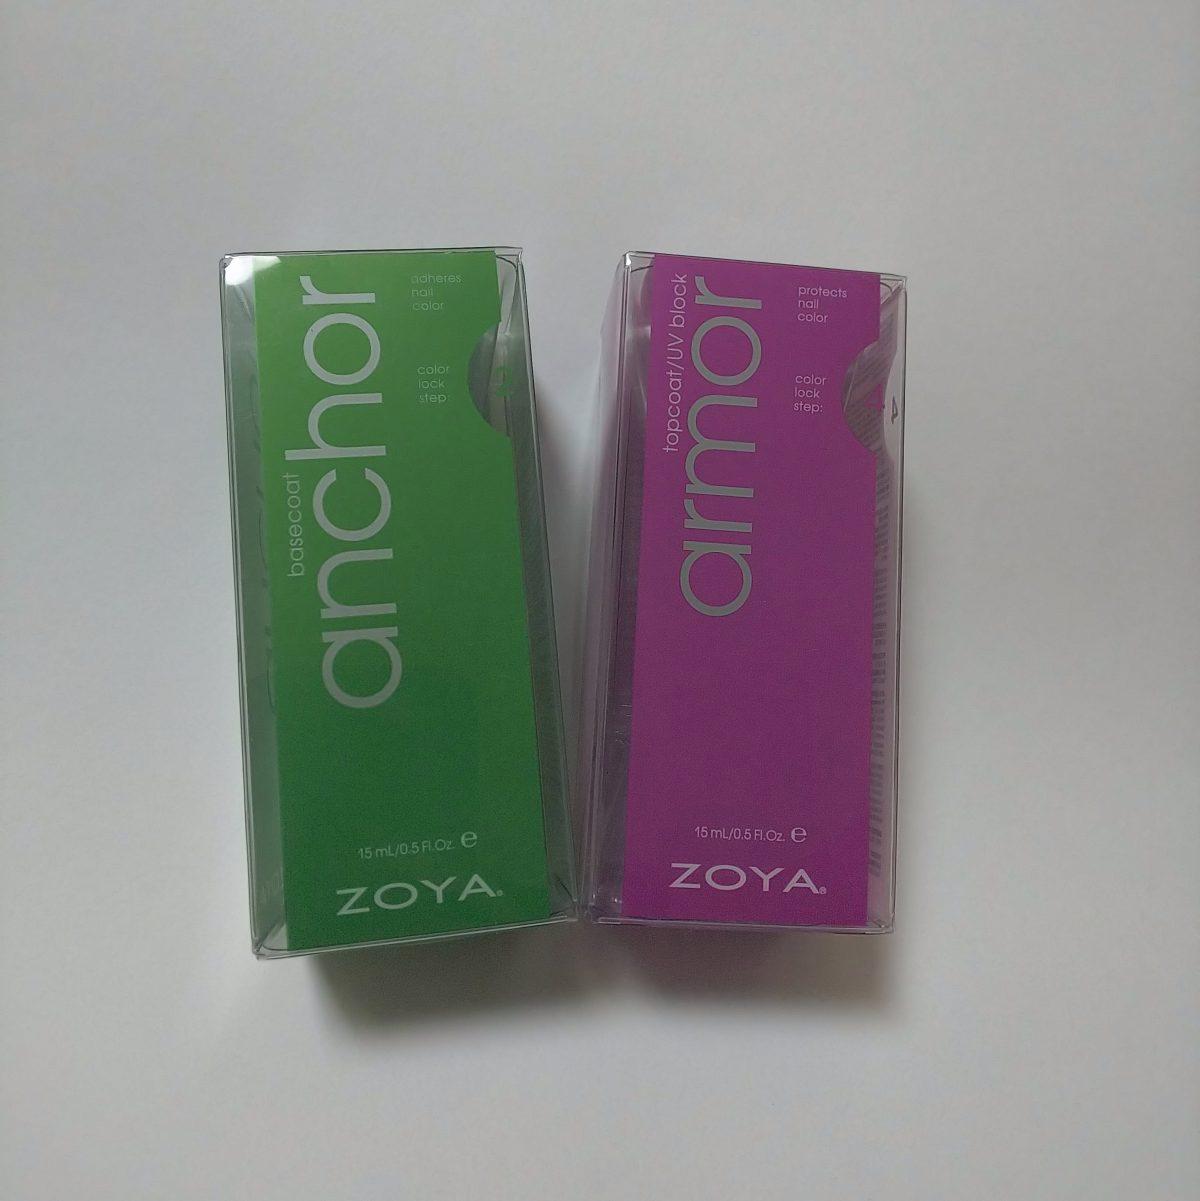 ZOYAのベースコートとトップコートを買ってみた!